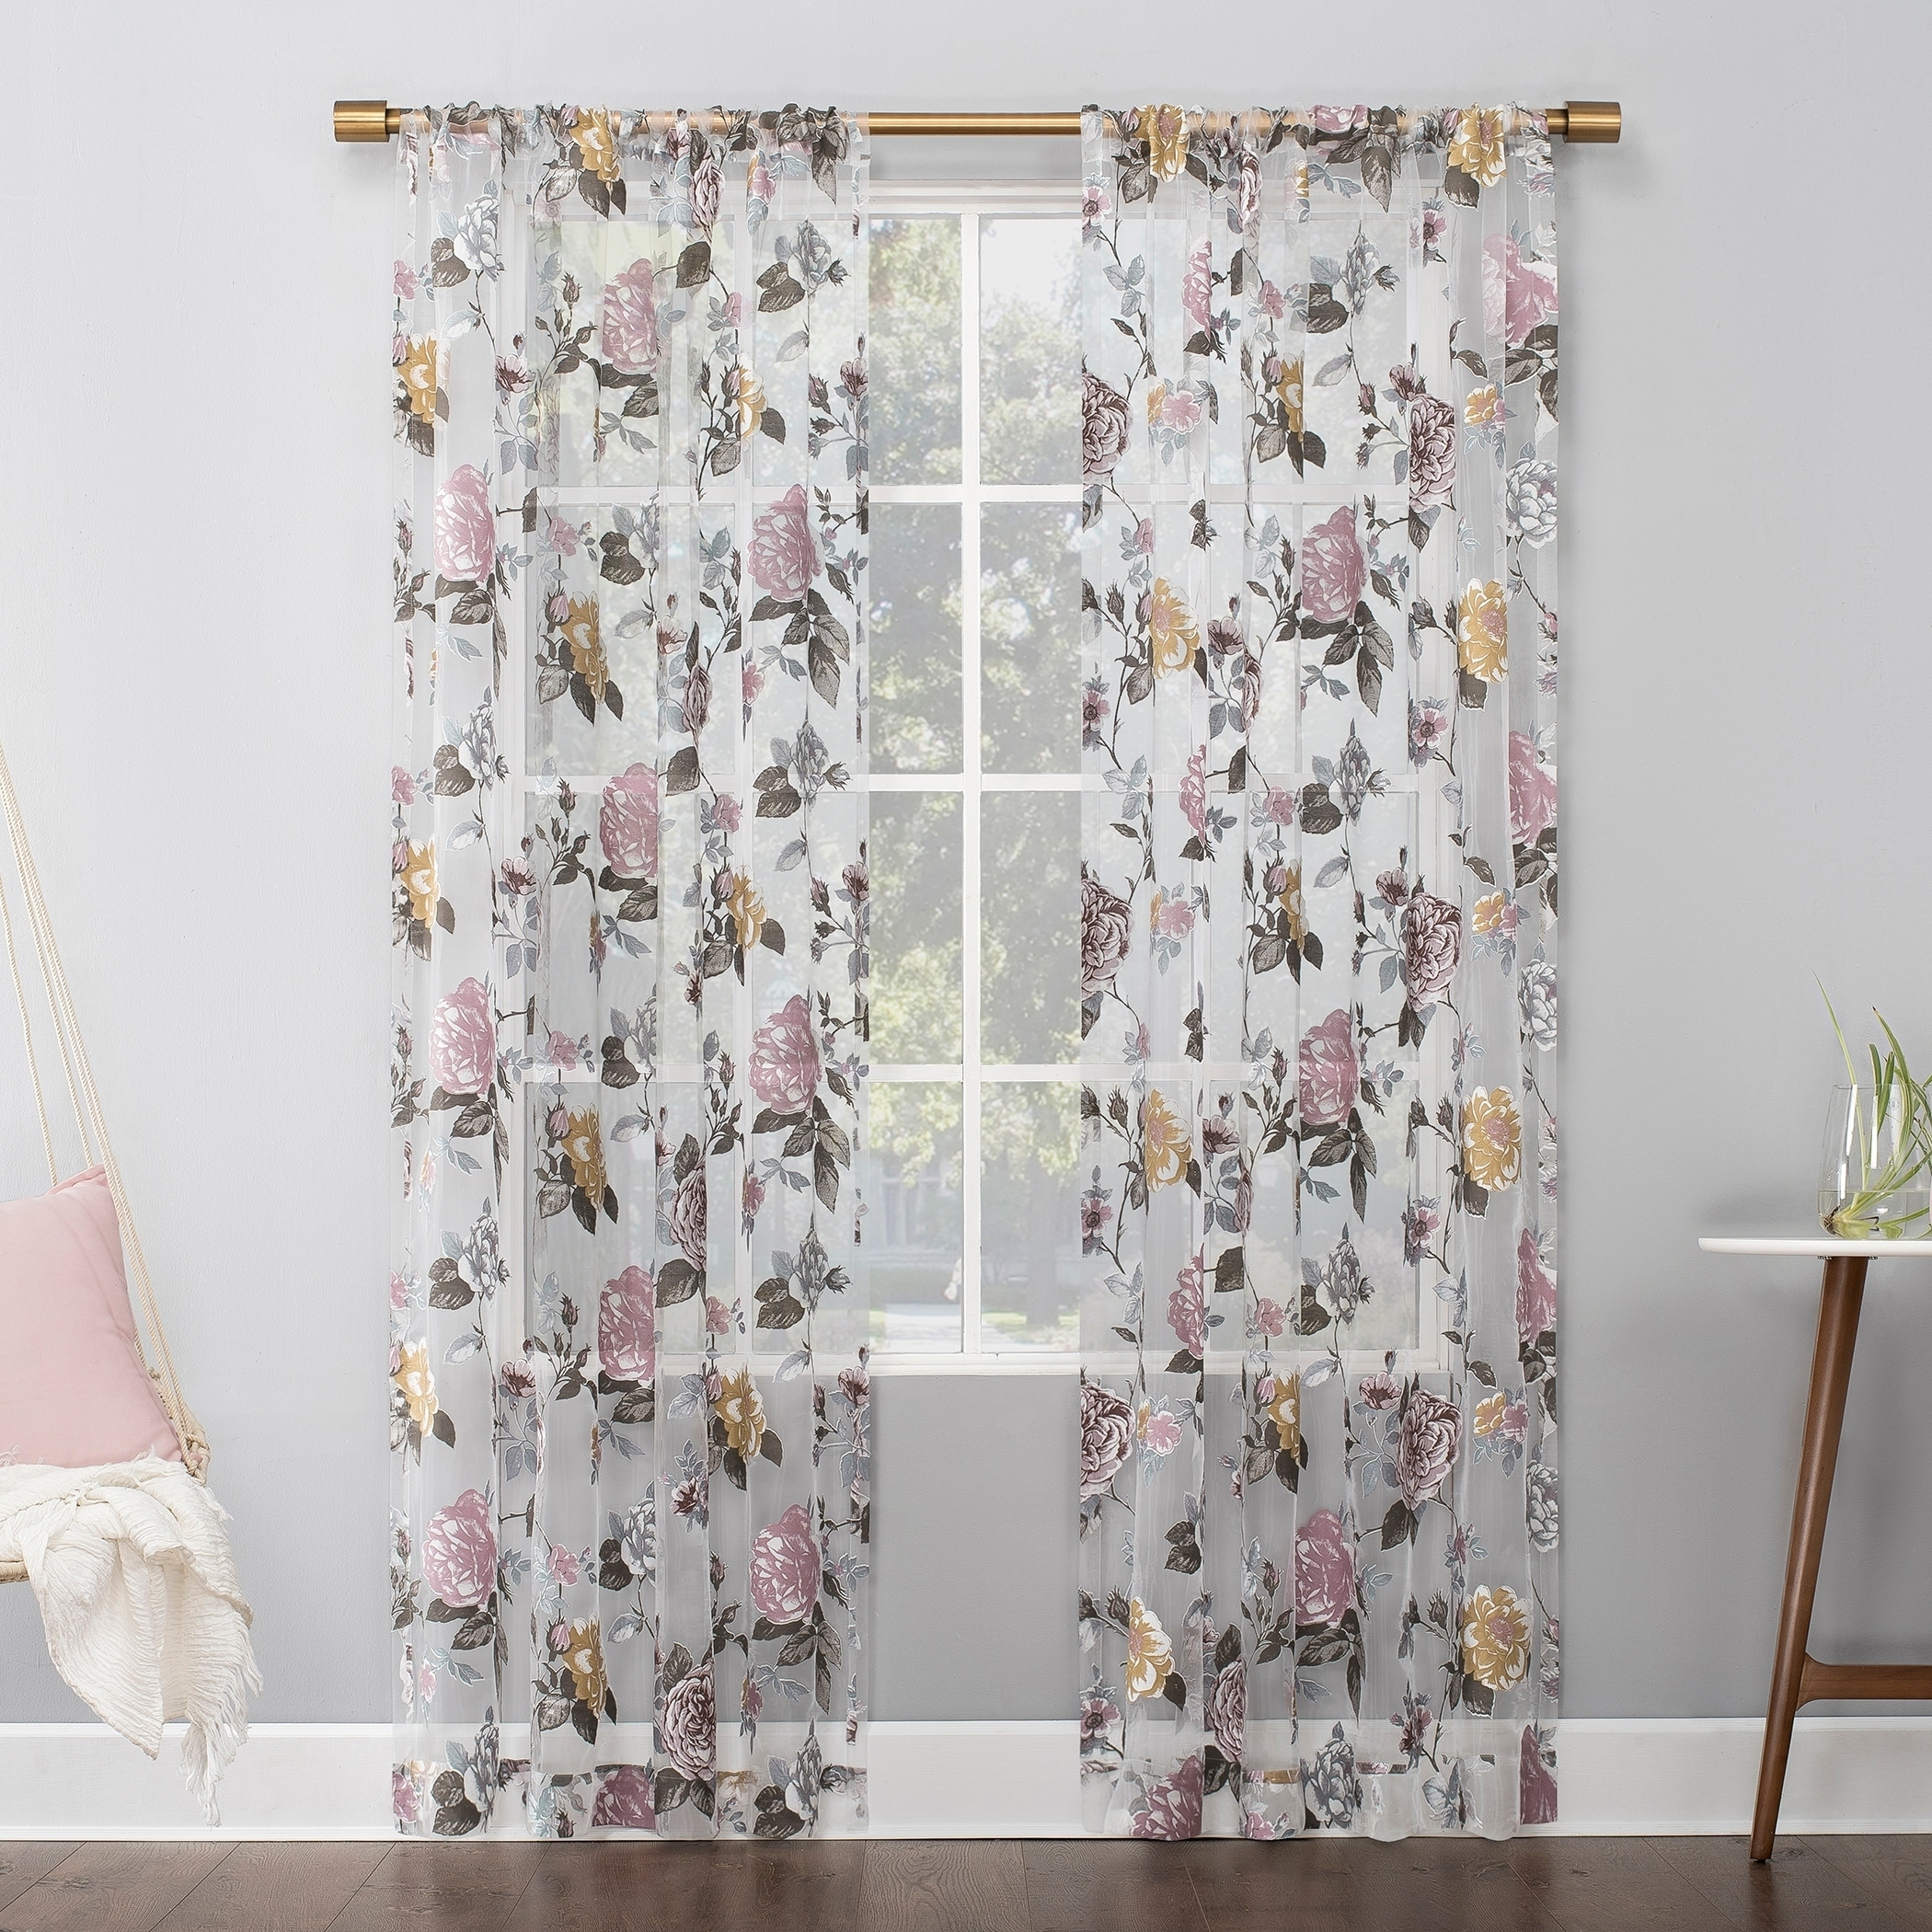 No 918 Garden Floral Burnout Semi Sheer Rod Pocket Curtain Panel Overstock 29826469